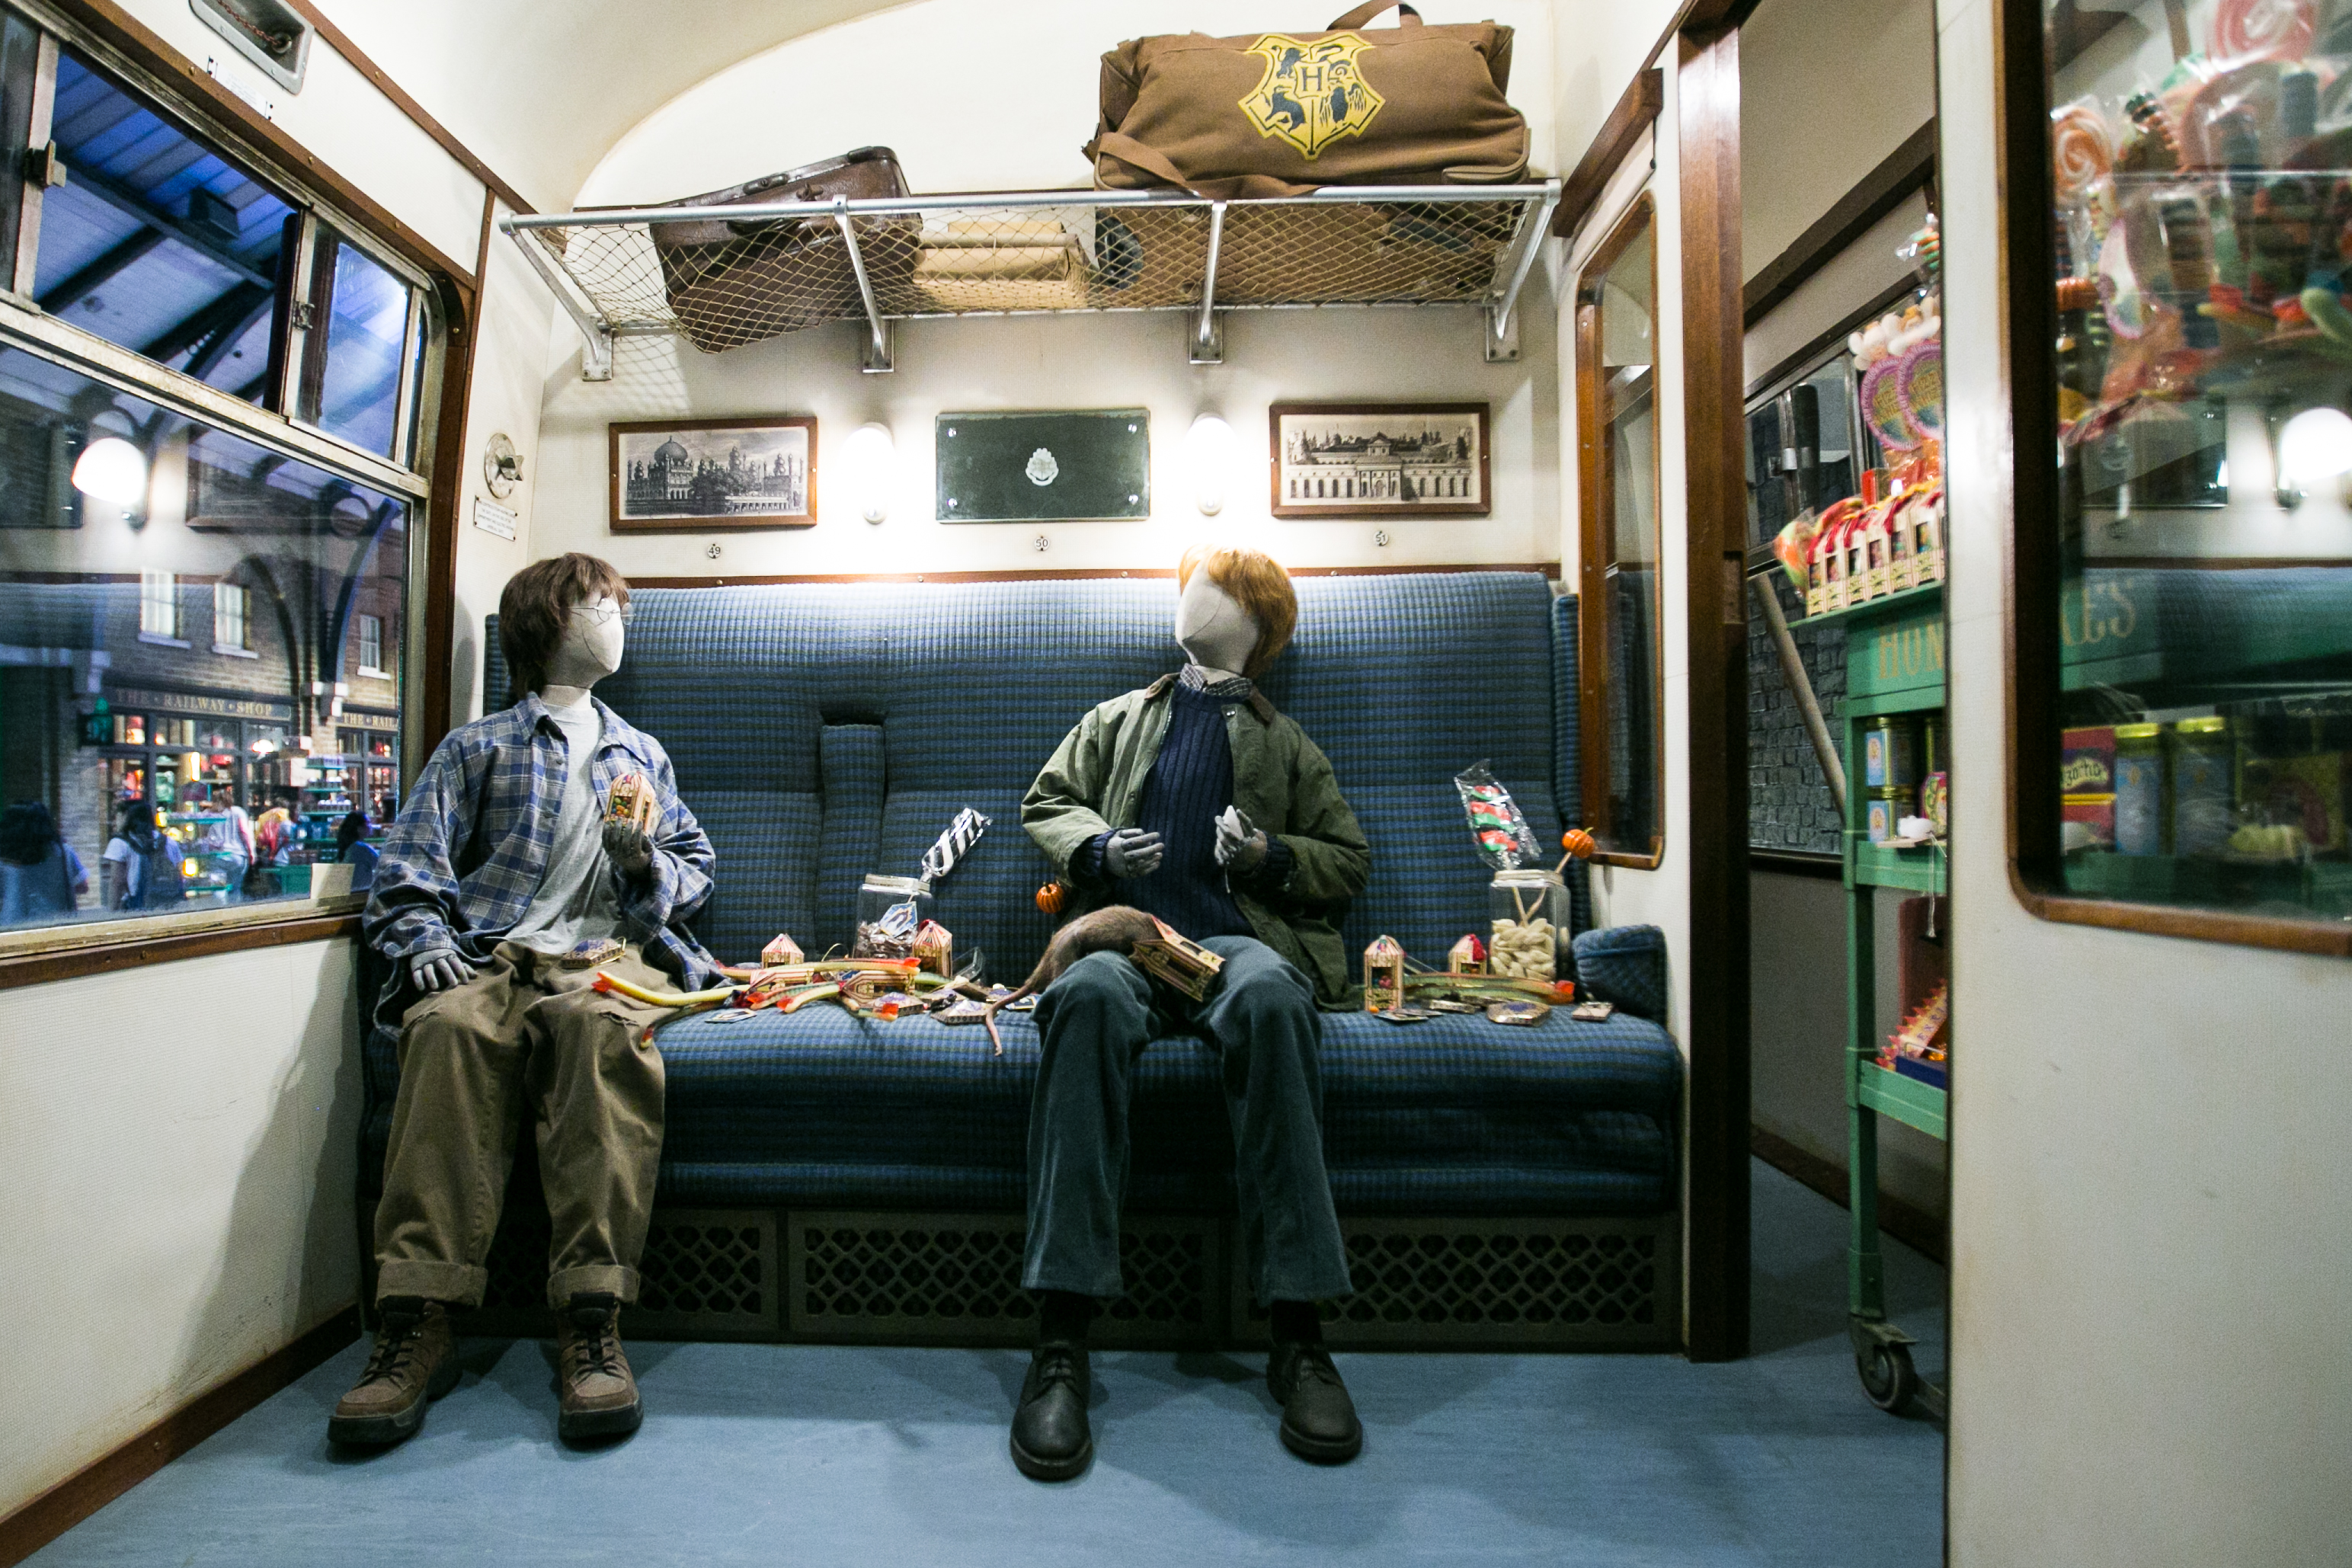 harry-potter-studio-tour-train-interior-3